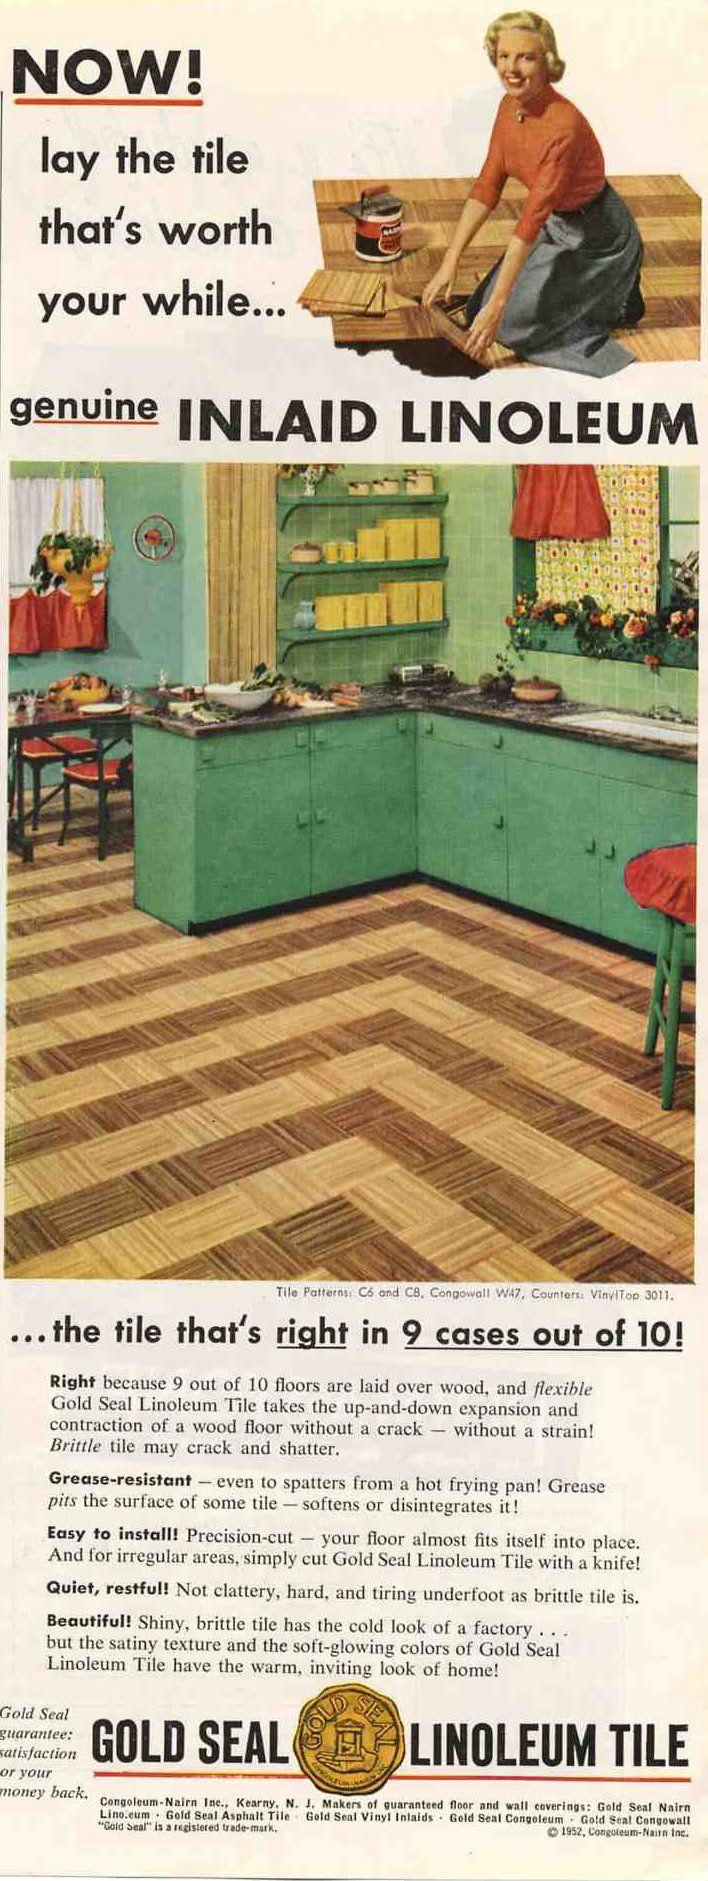 1952-gold-seal-inlaid-linoleum105.jpg 708×1881 pixels